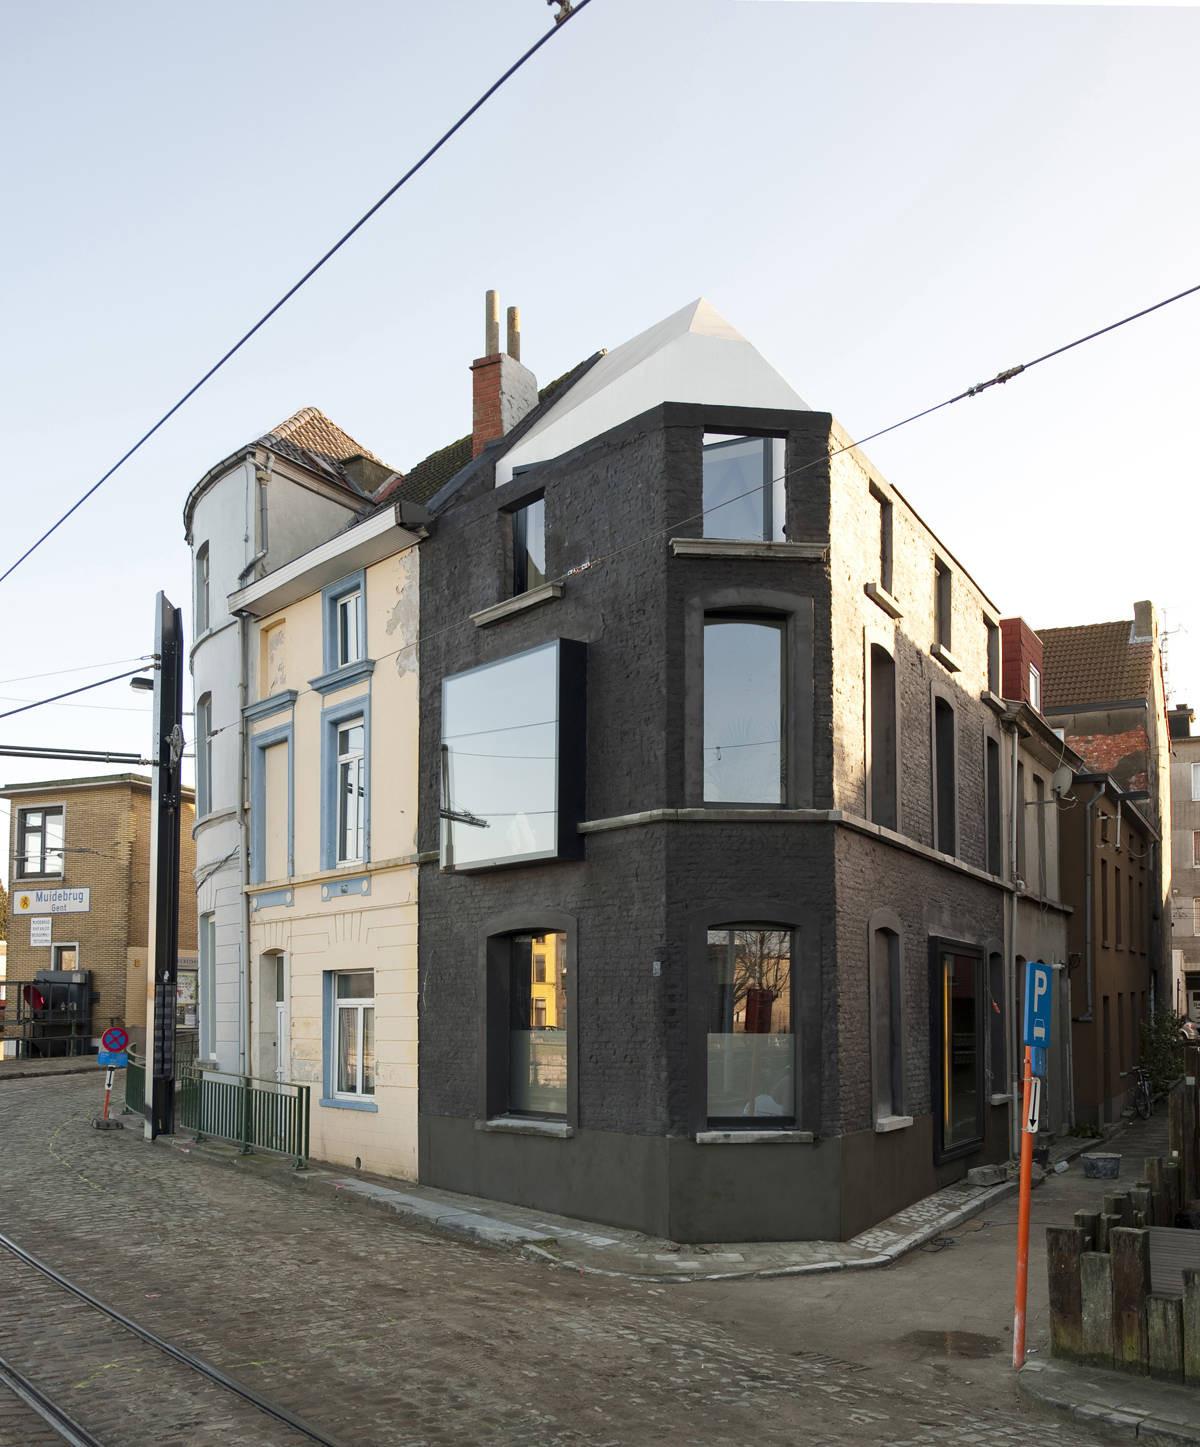 House G-S / GRAUX & BAEYENS architecten, © Luc Roymans